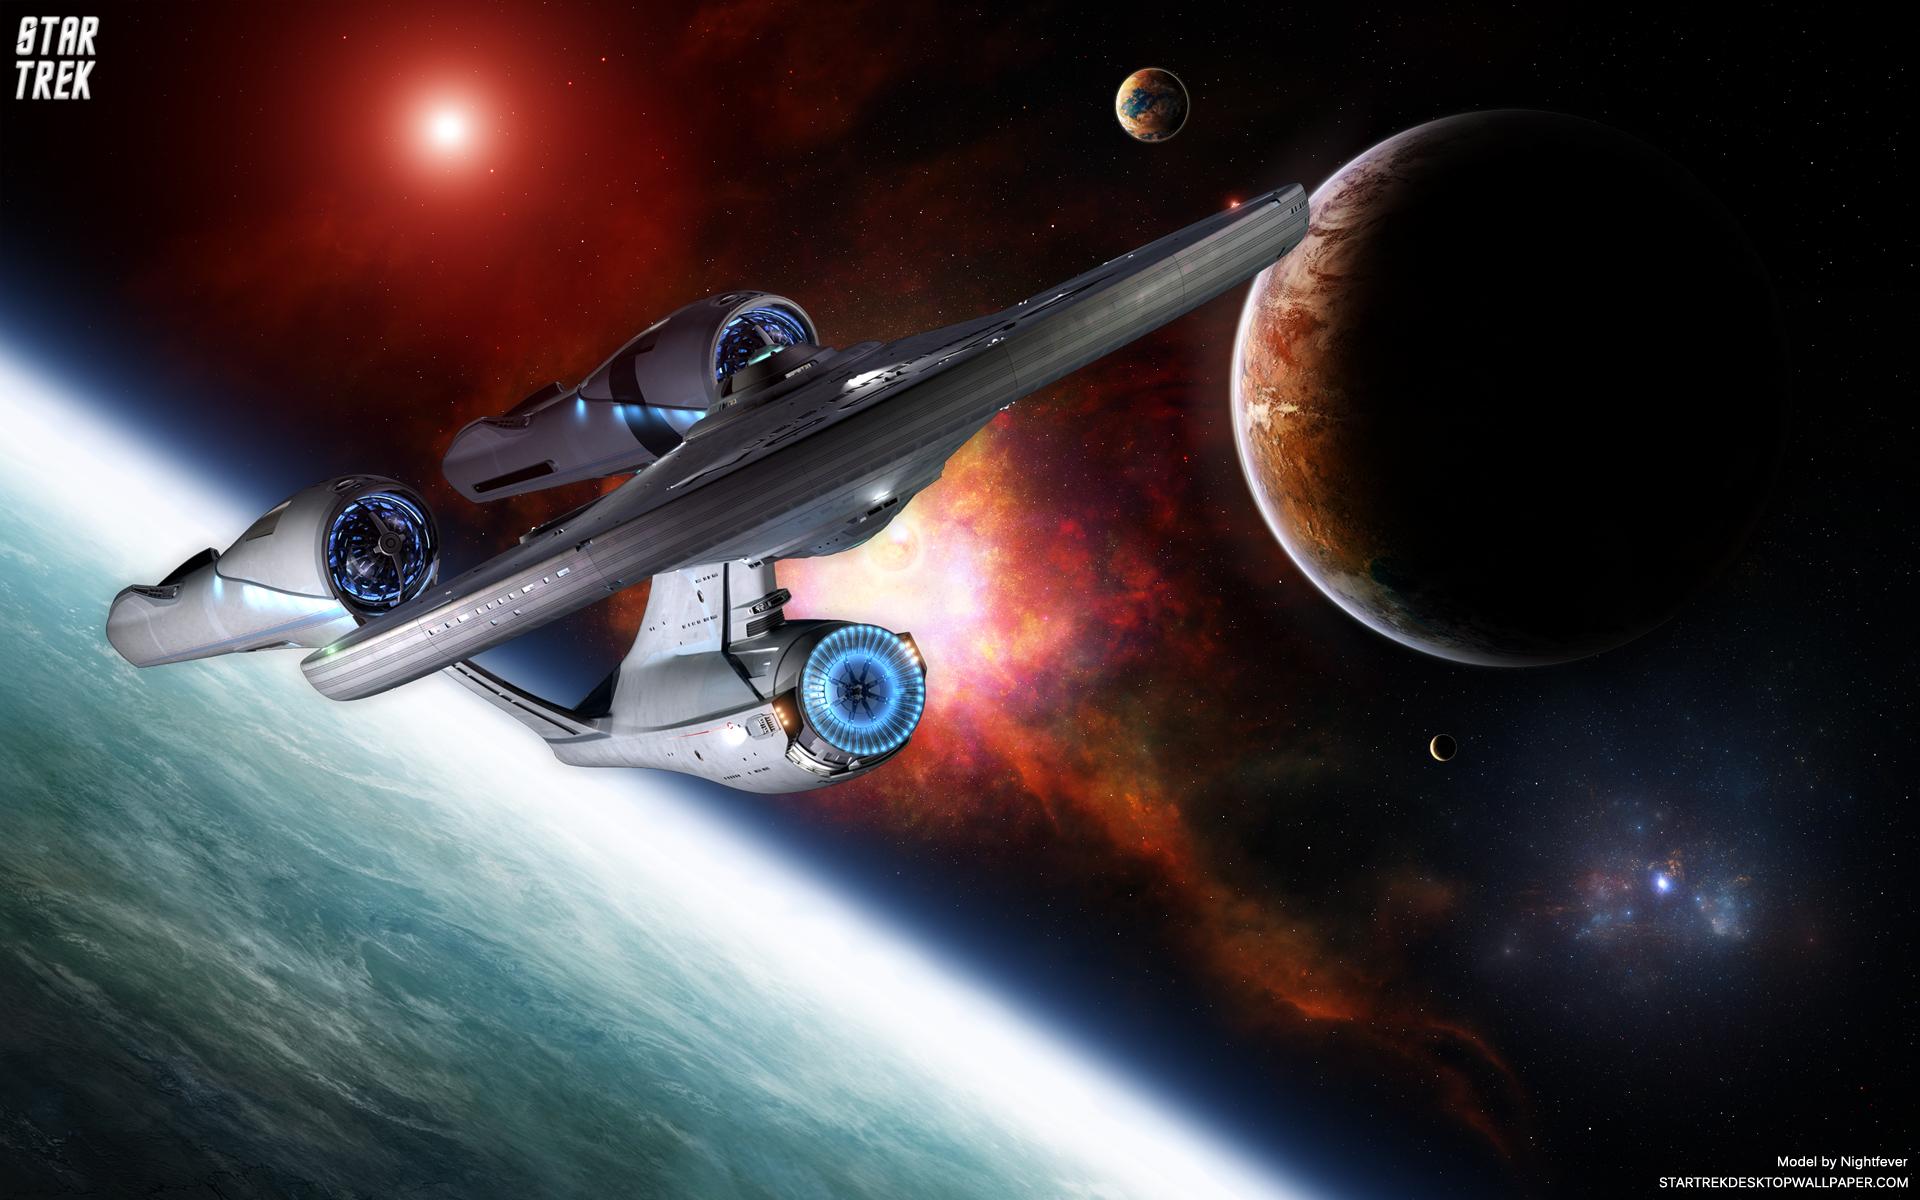 Star Trek Uss Enterprise wallpaper   420108 1920x1200